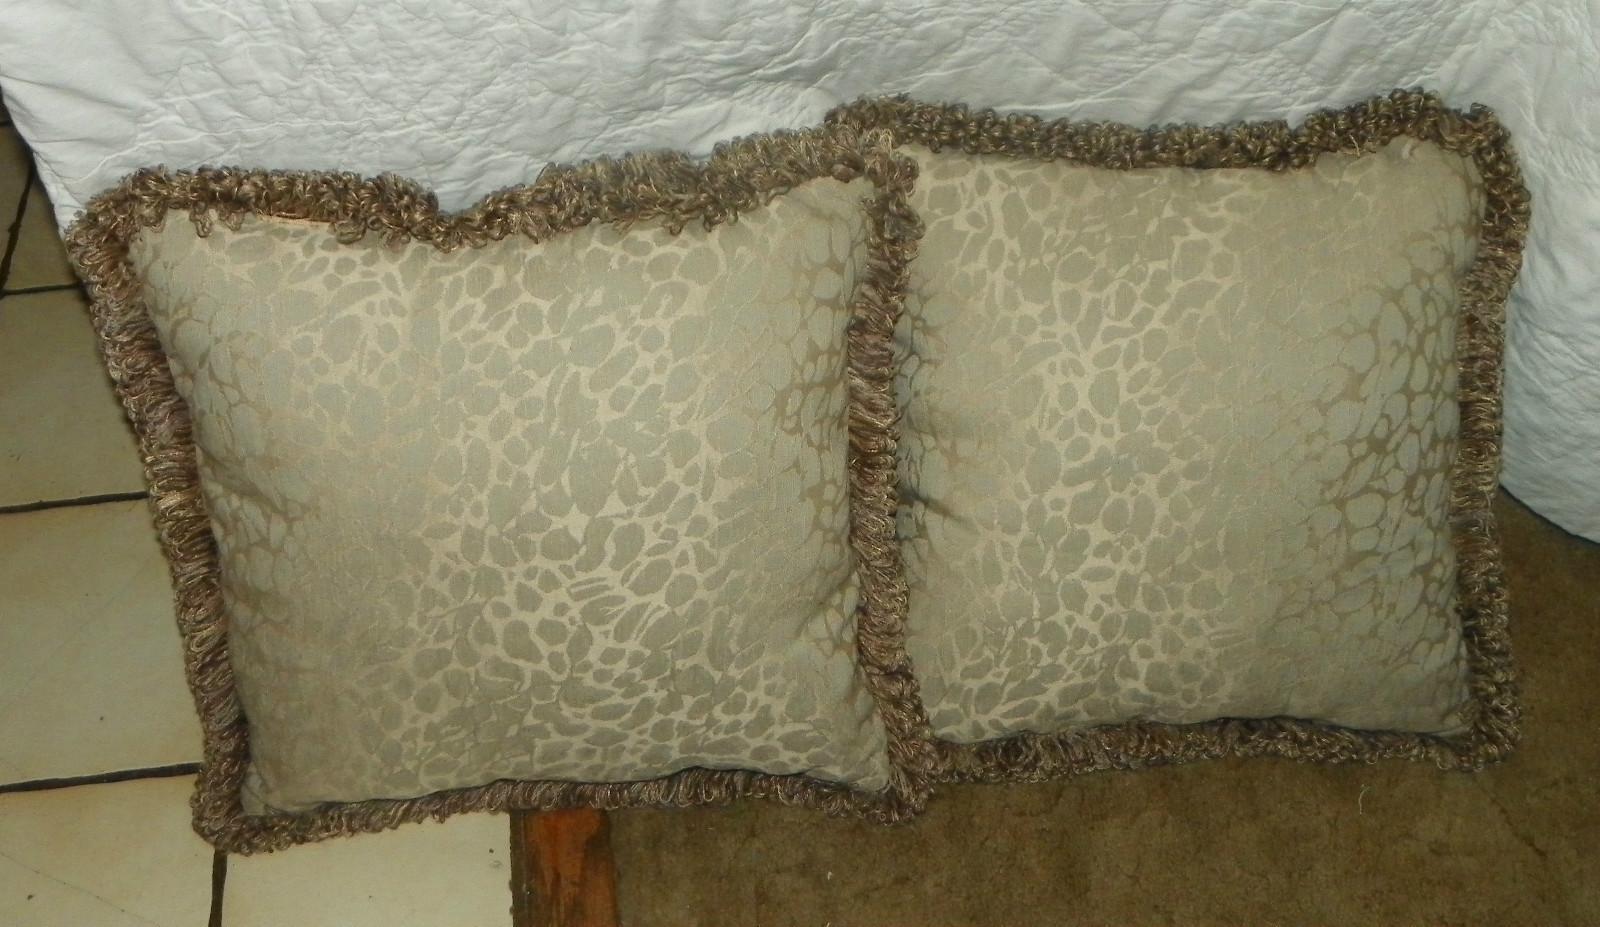 Burgundy Print Throw Pillows : Pair of Burgundy Beige Brown Print Throw Pillows - Pillows